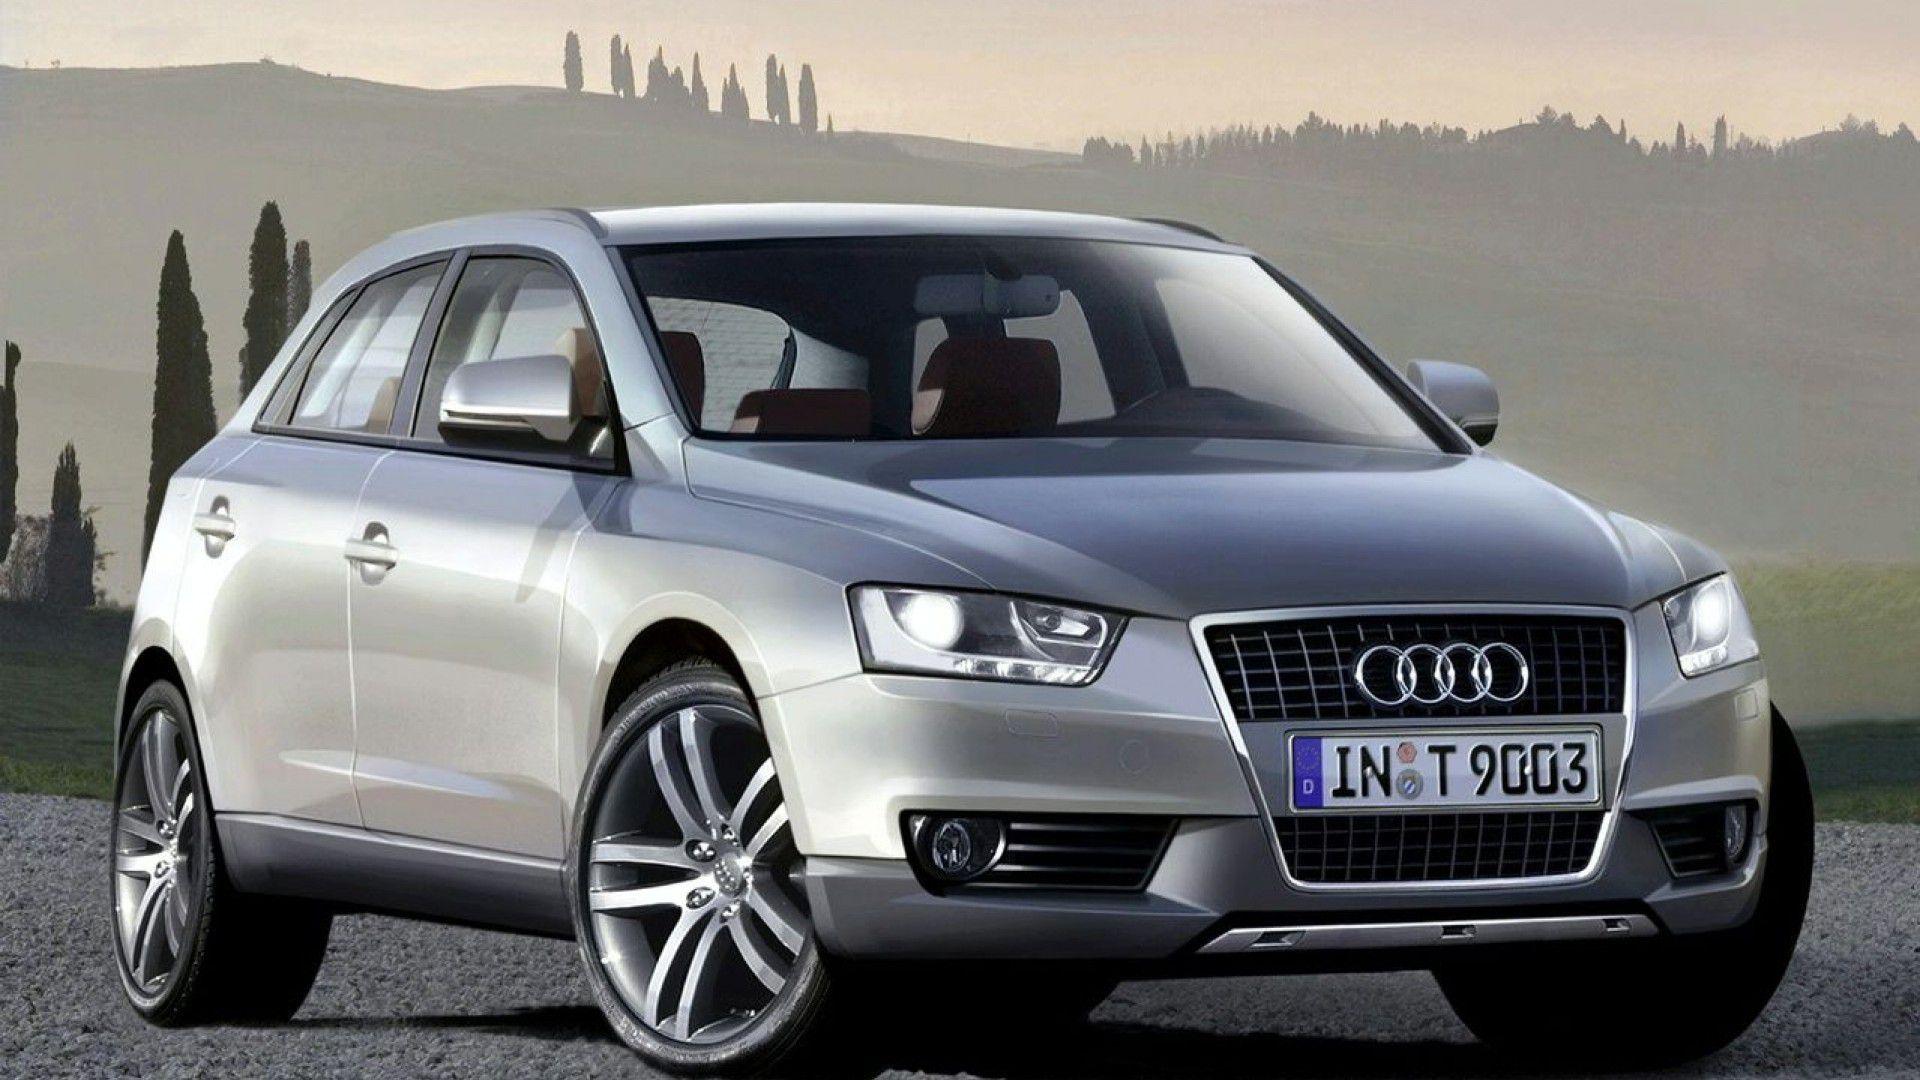 Audi Q3 (2011 to Present)